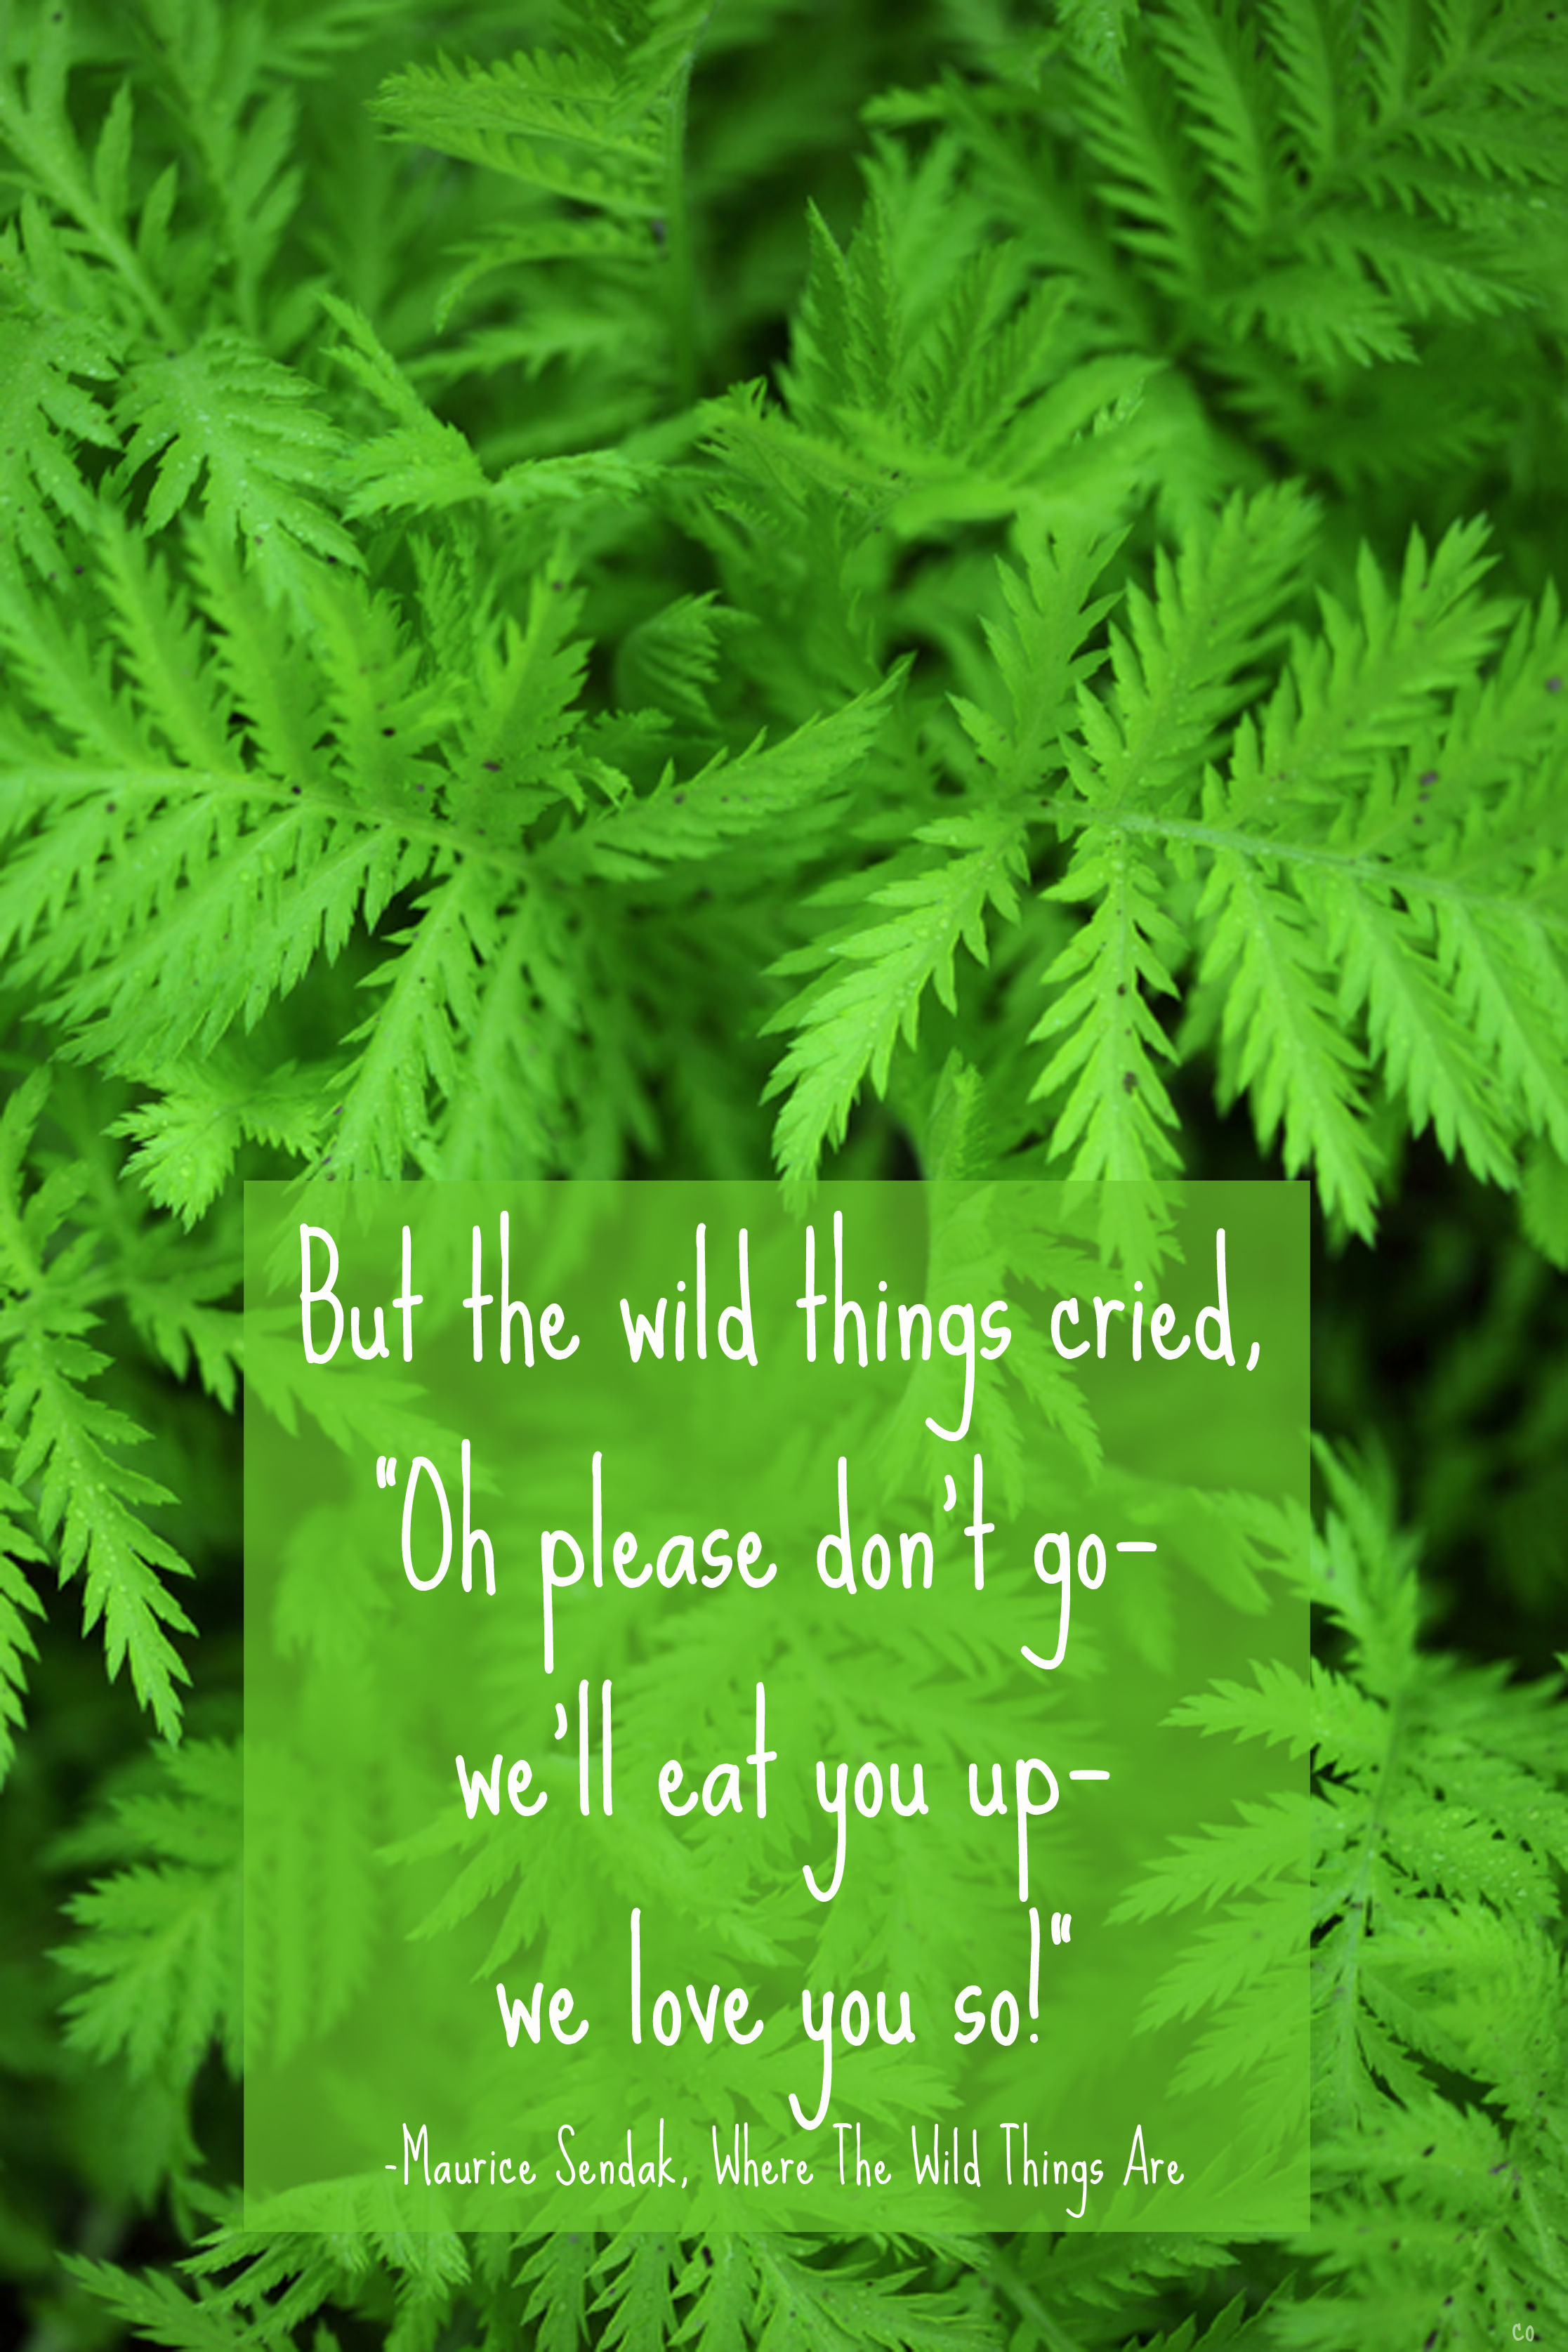 Maurice Sendak's quote #4